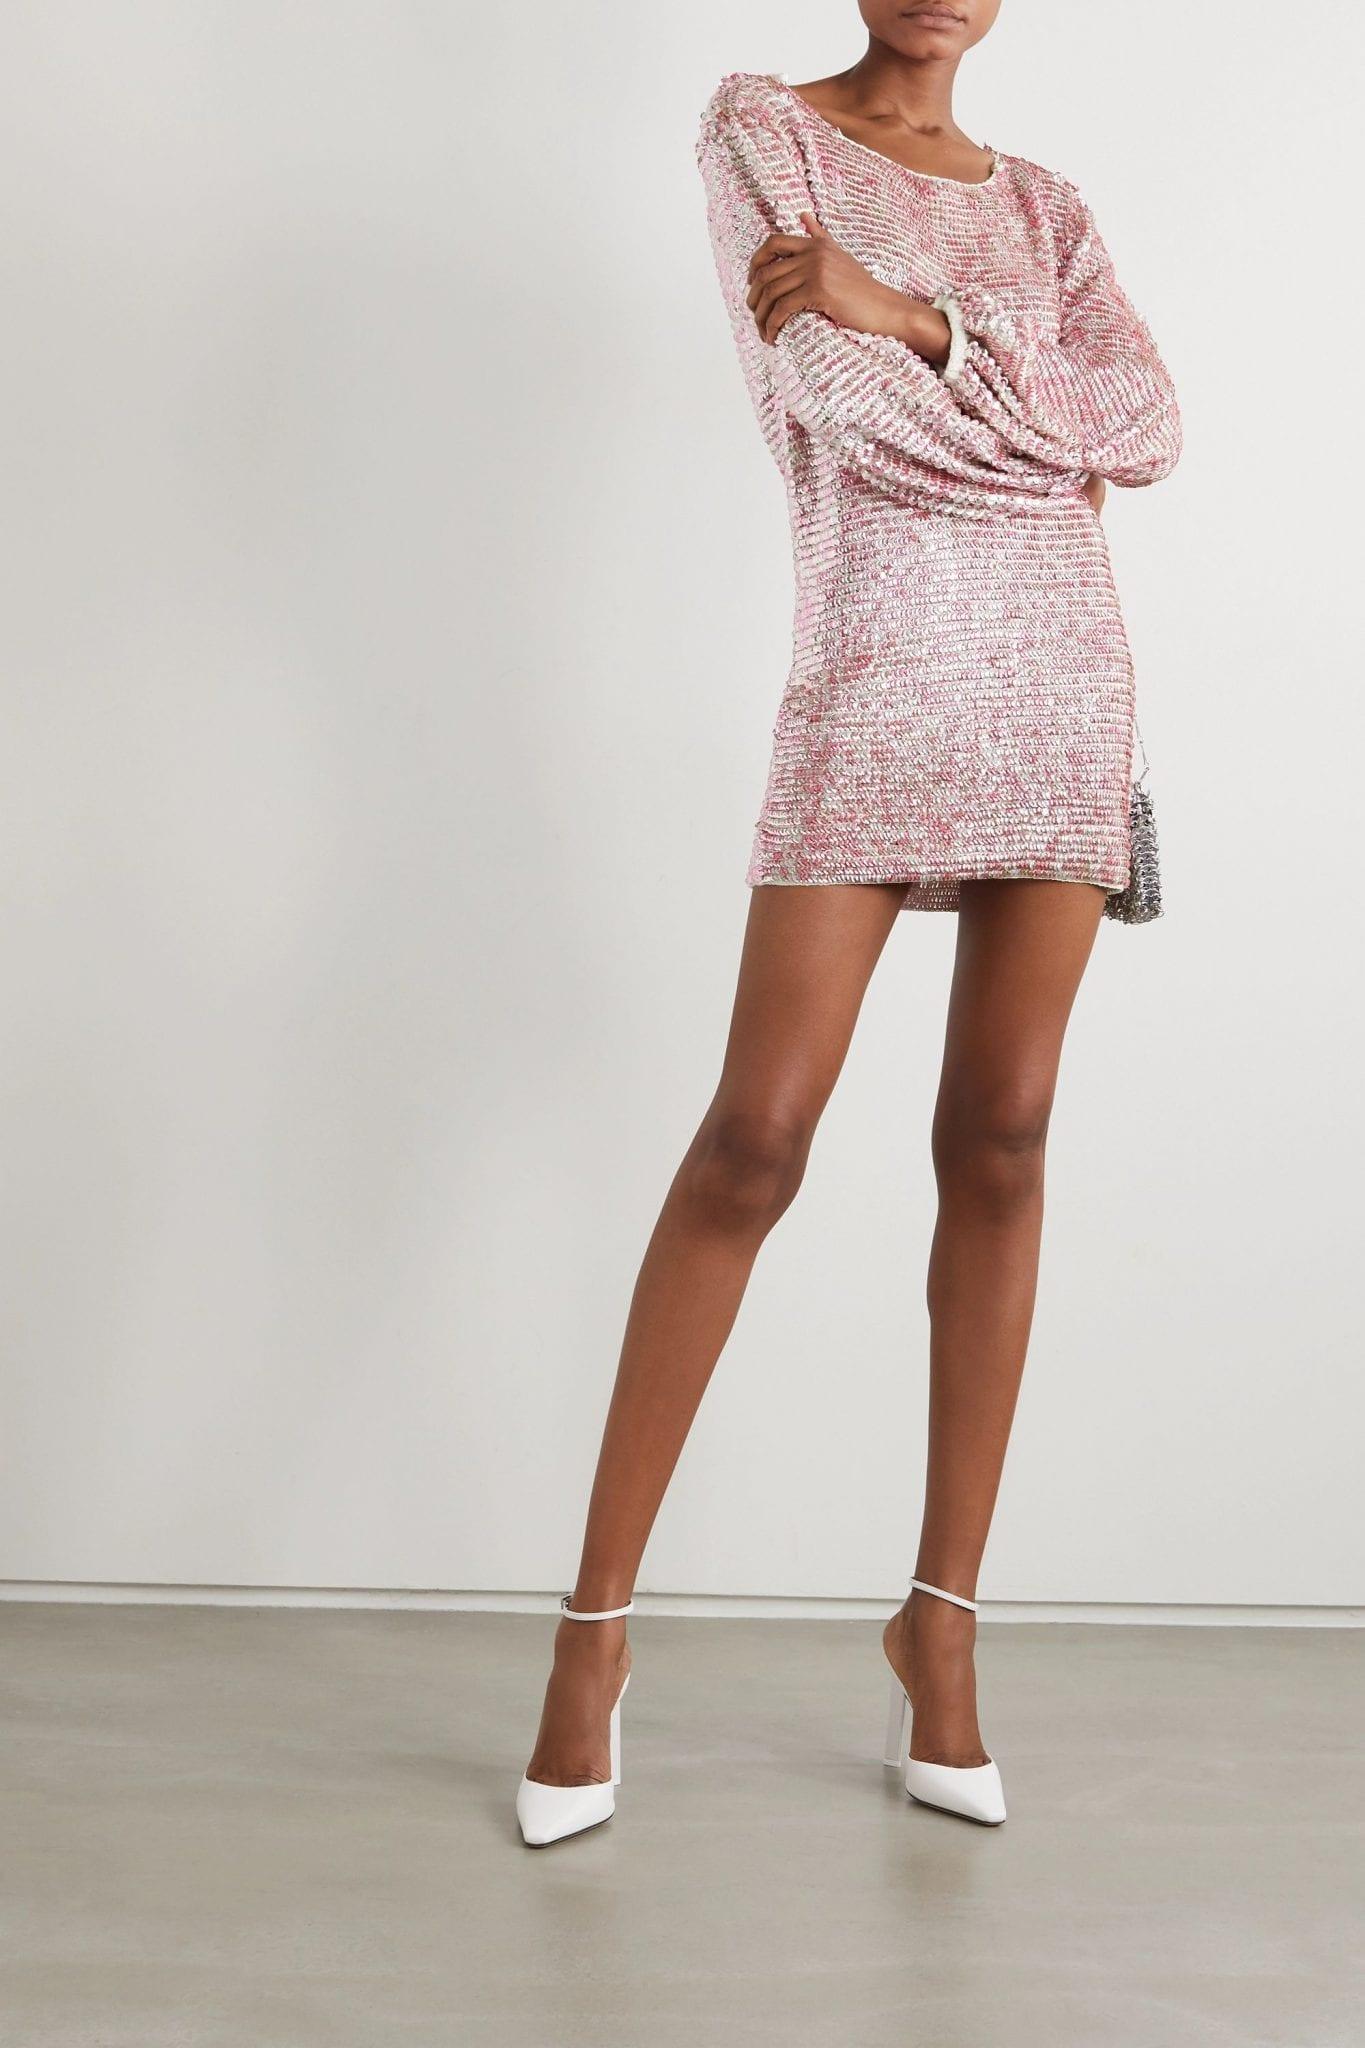 RETROFÊTE Tara Open-back Sequined Crocheted Cotton Mini Dress